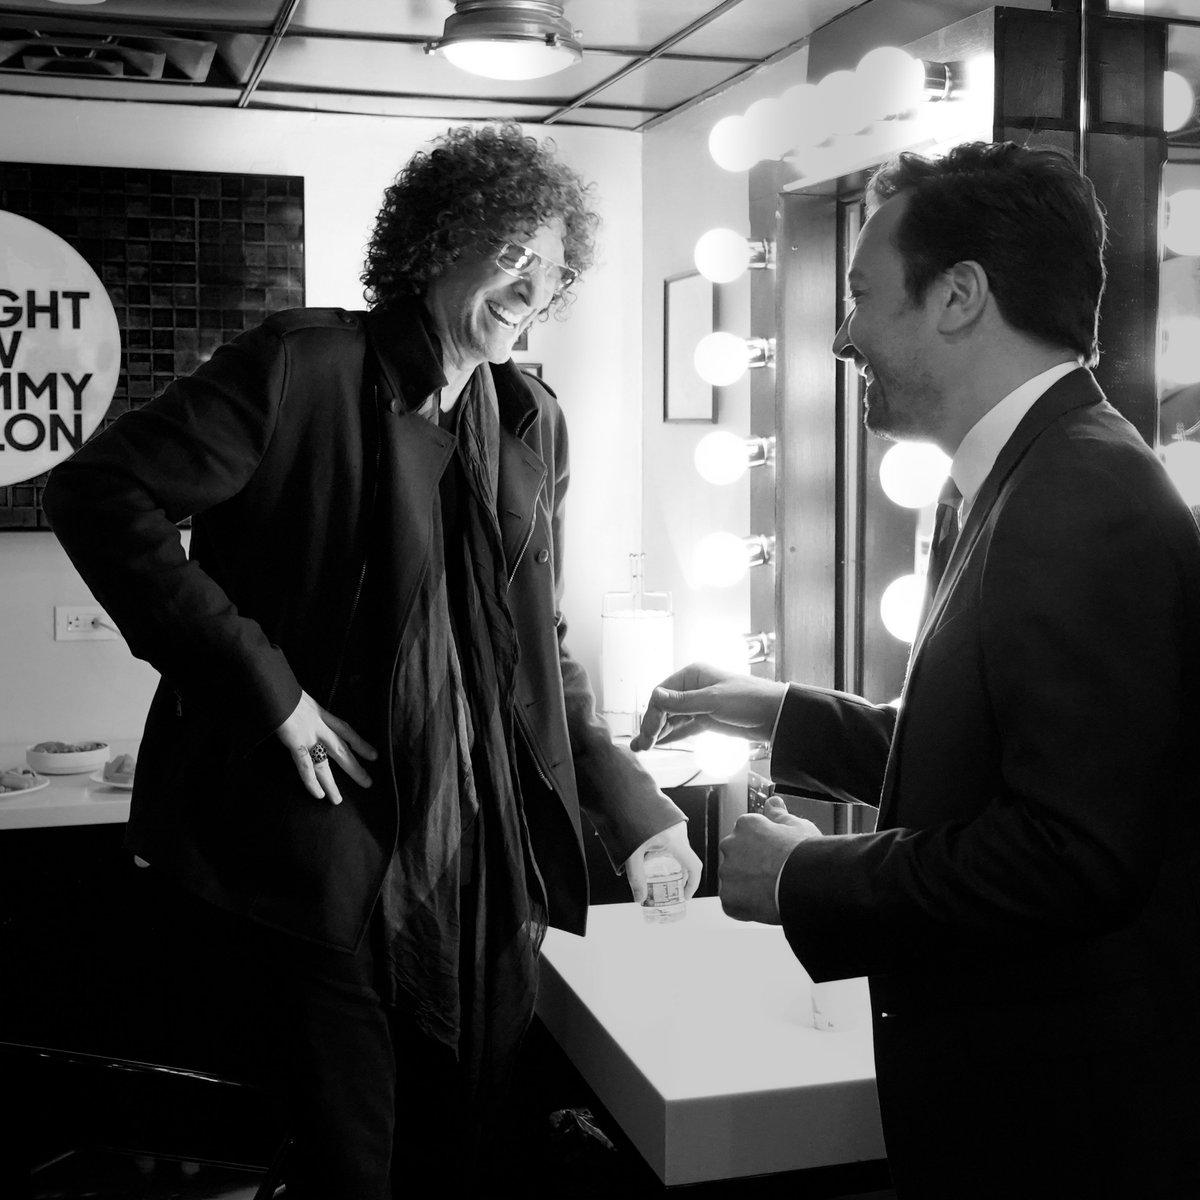 RT @jimmyfallon: Conversations with a friend #HowardSternComesAgain https://t.co/SYkvDjgjeZ